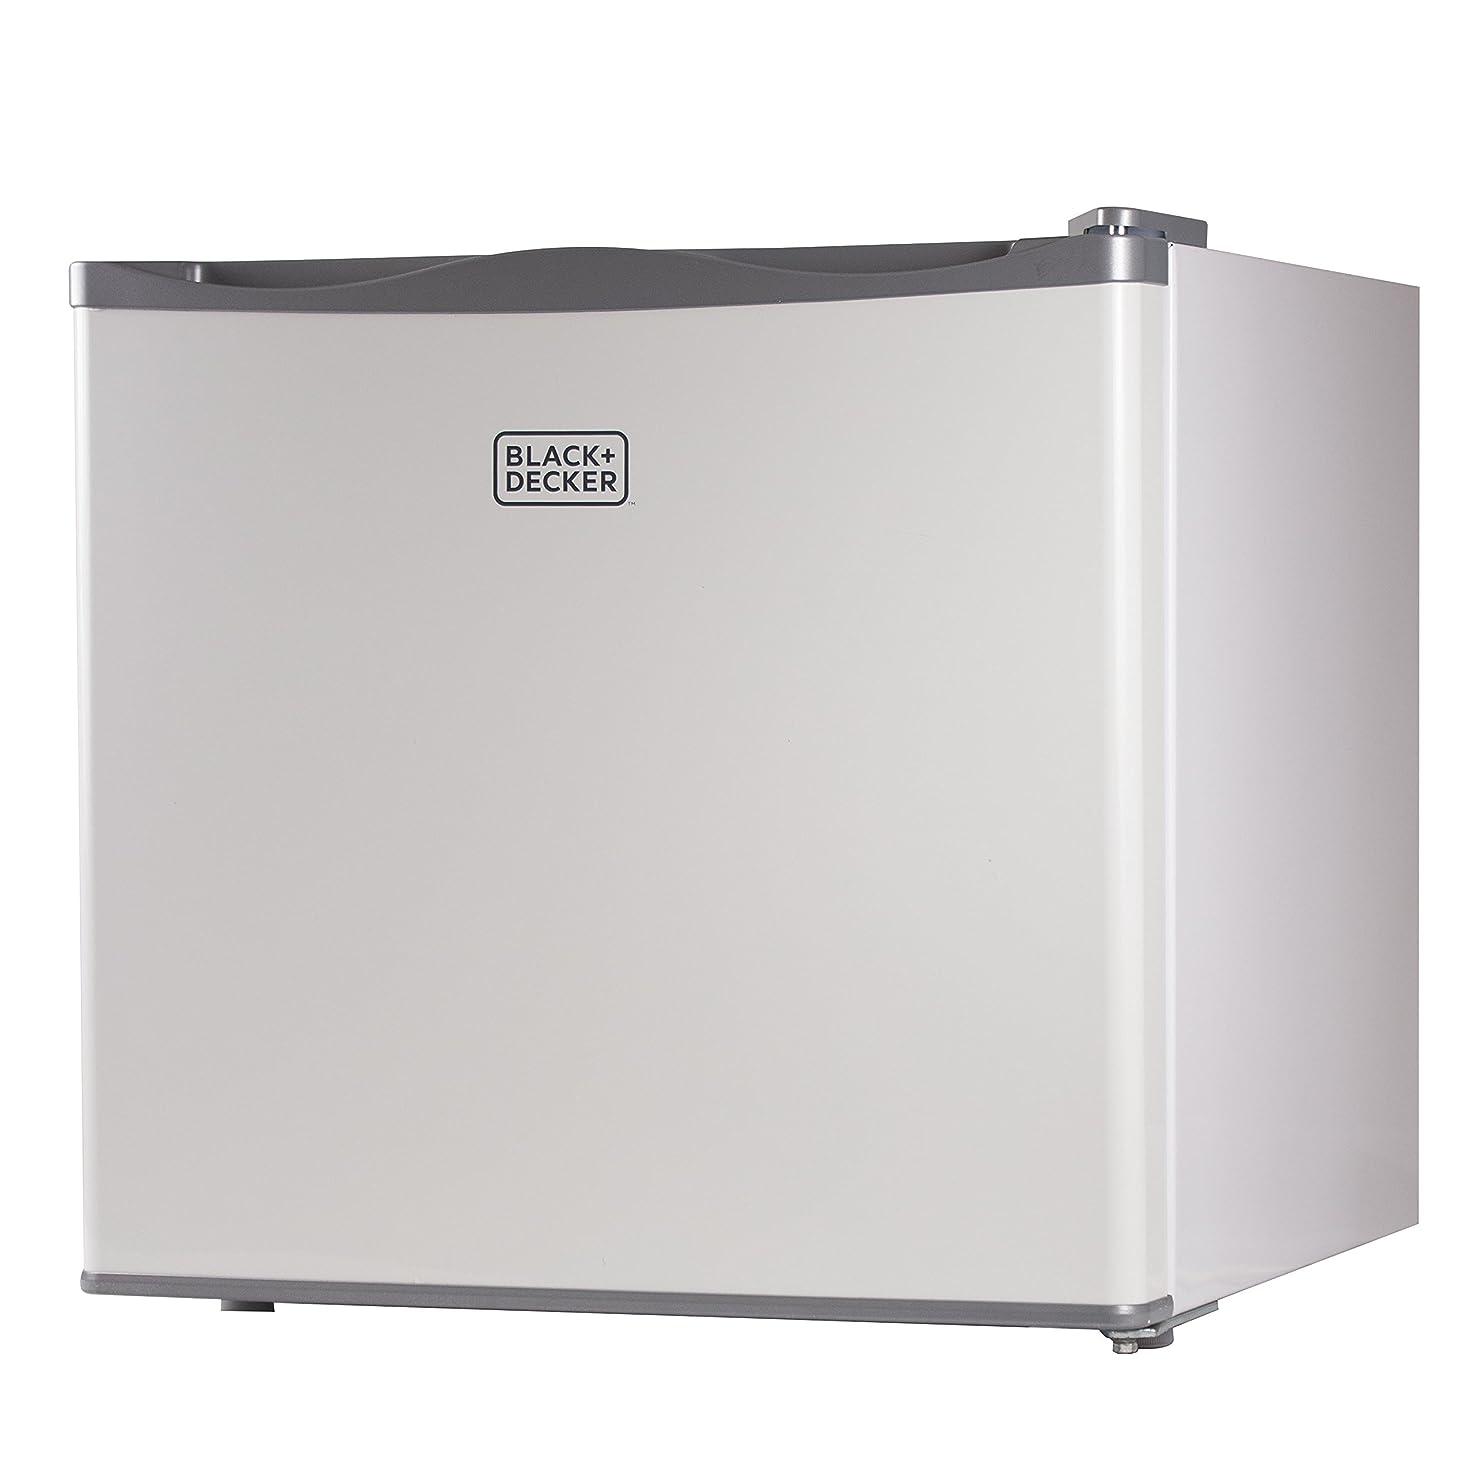 BLACK+DECKER WACDBUFK12W Compact Upright Freezer, Single Door, 1.2 Cubic Feet, White BUFK12W